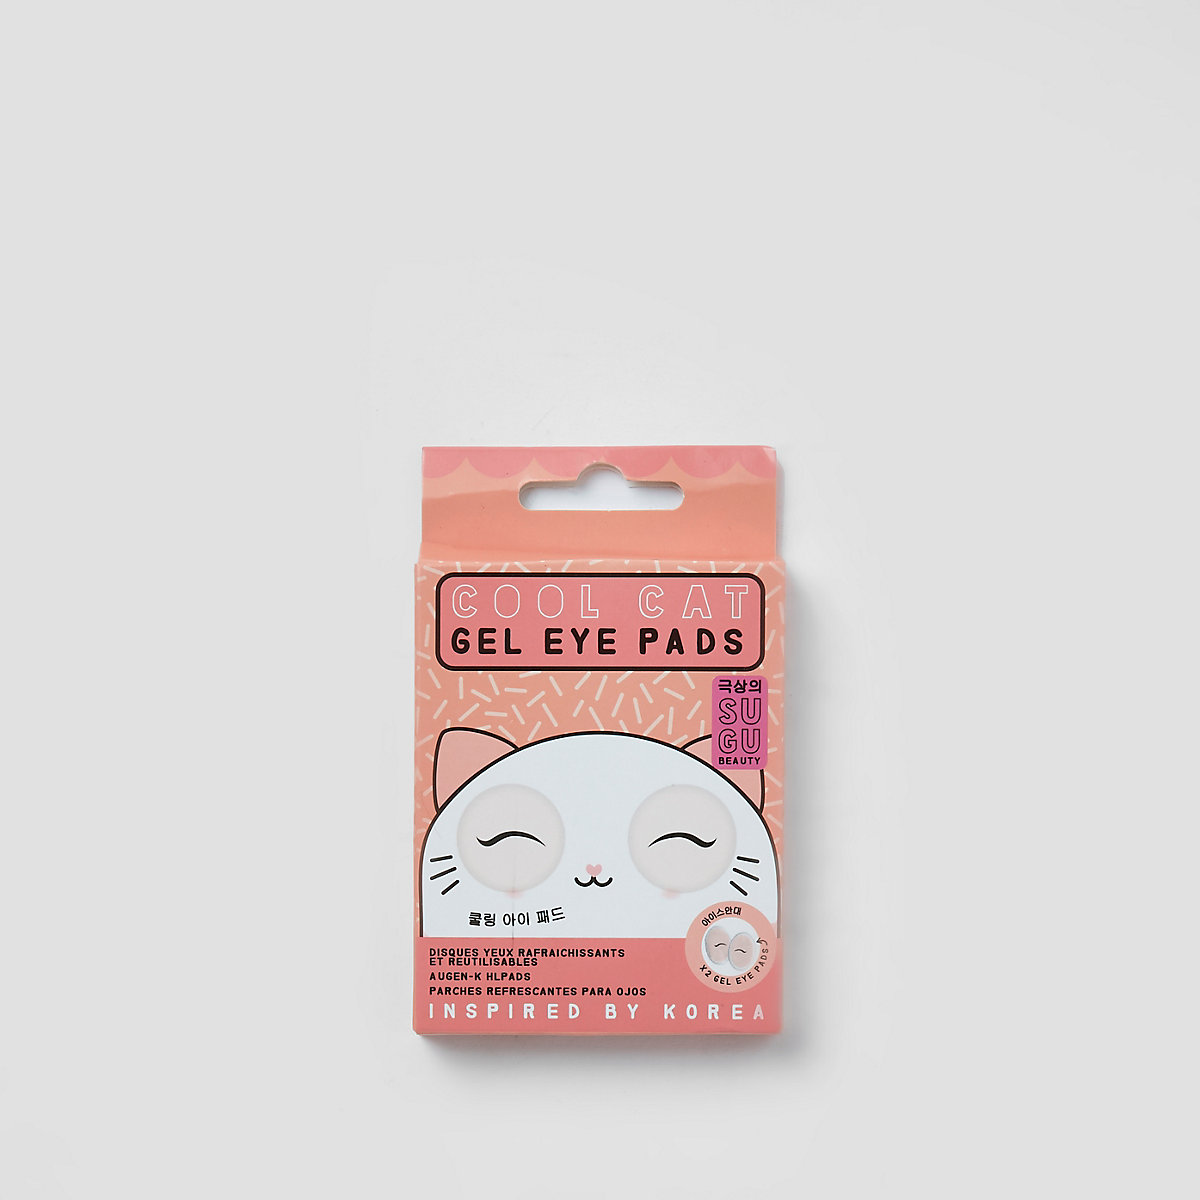 Sugu beauty cool cat gel eye pads